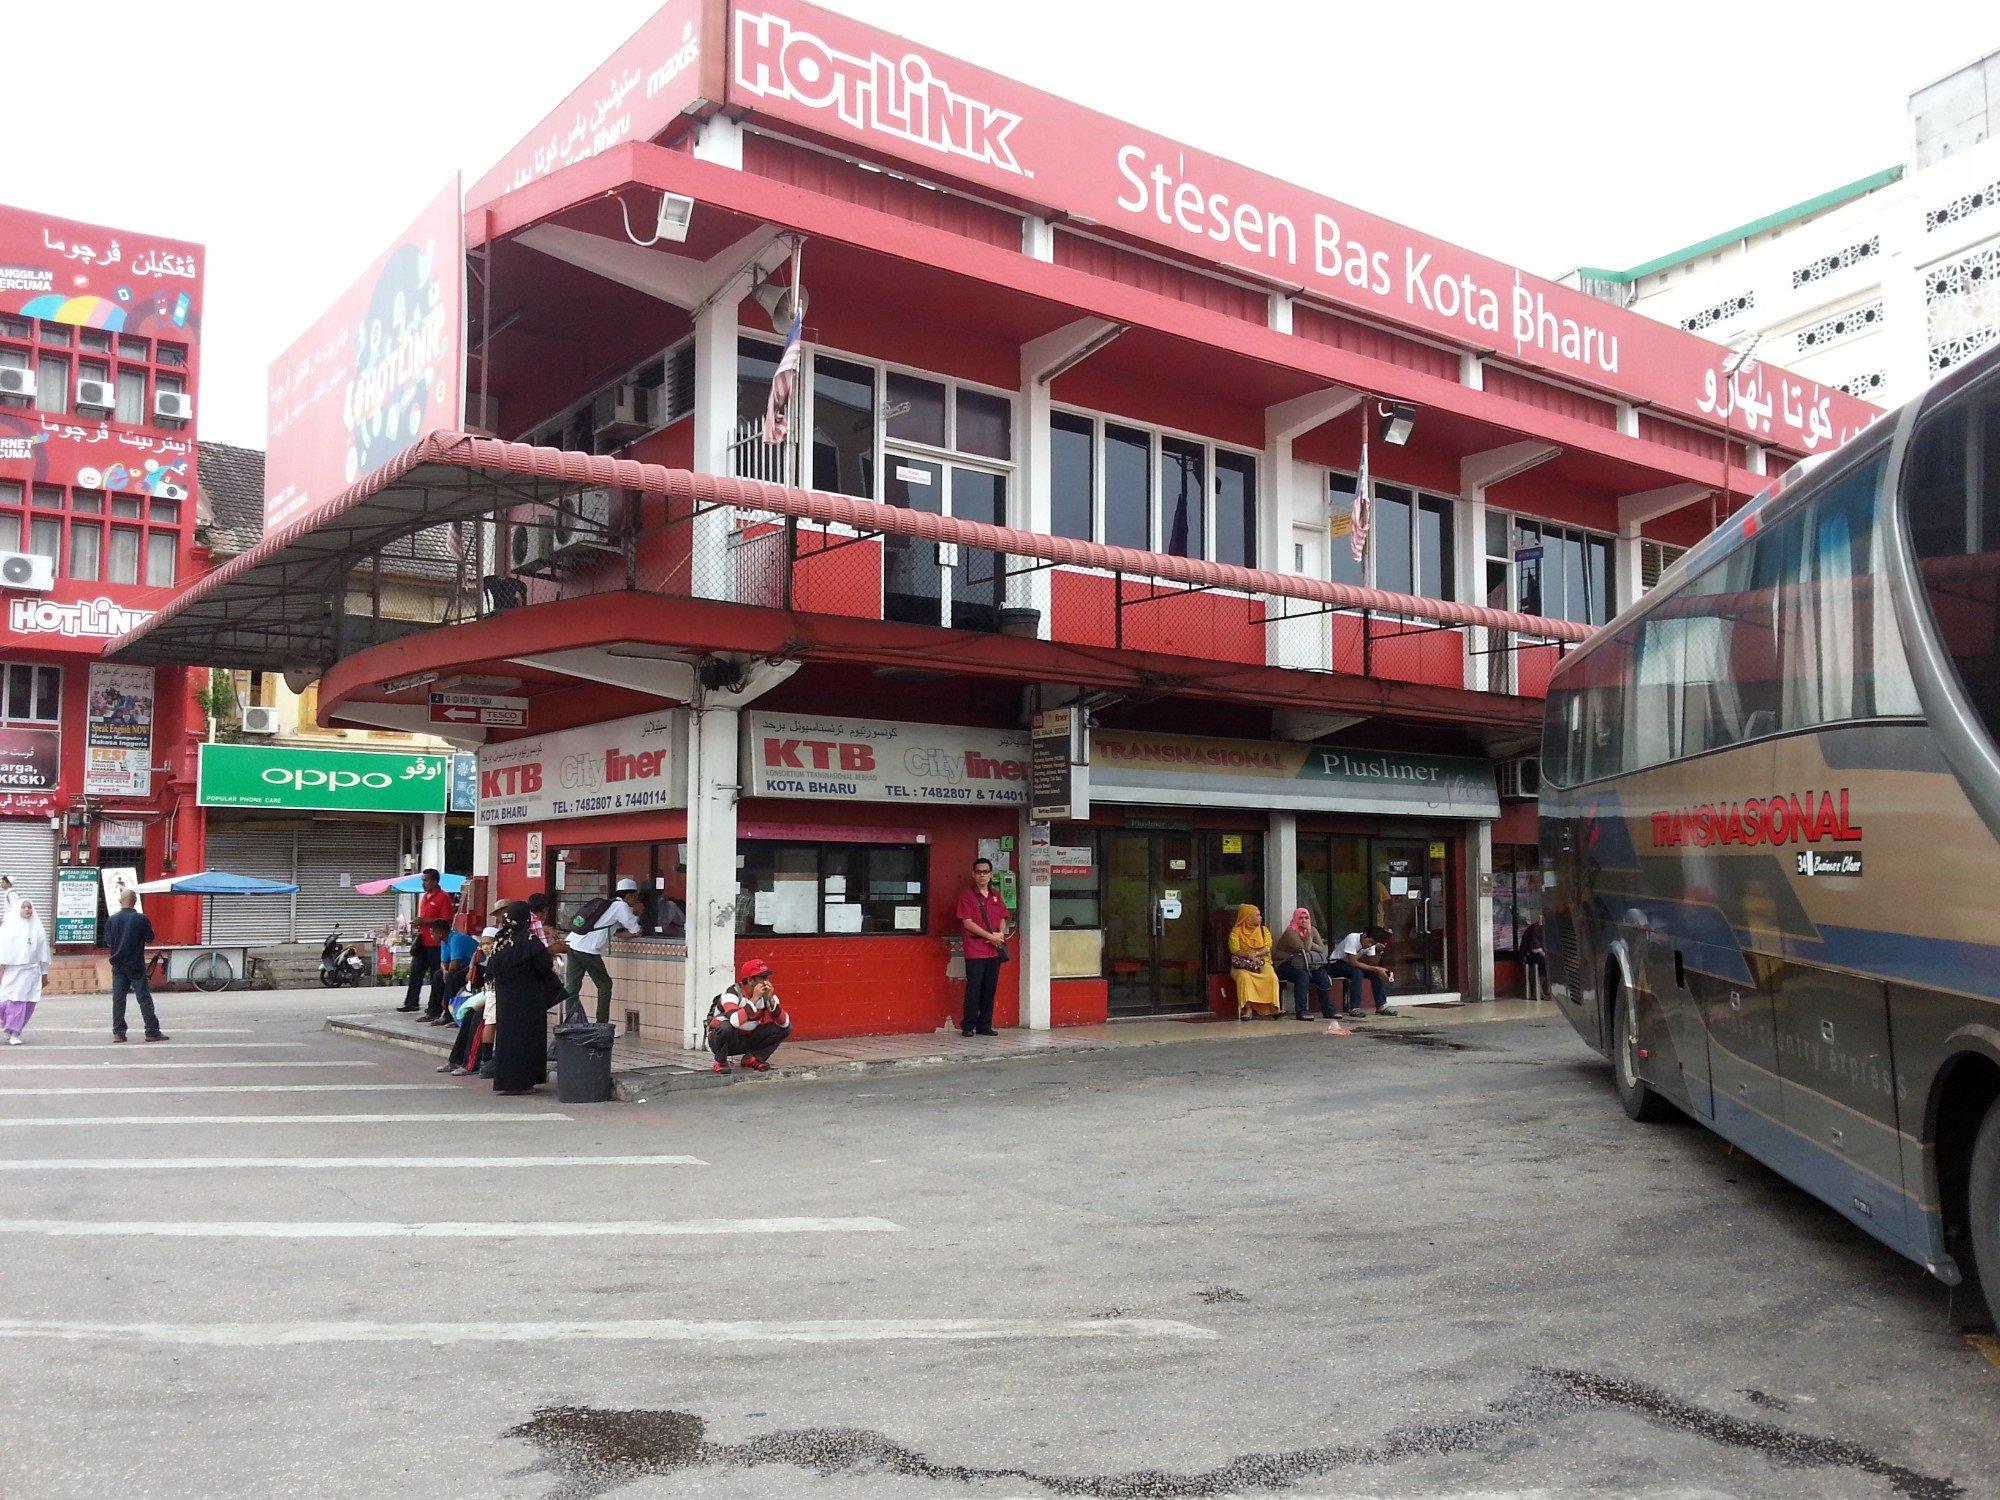 Bus services to Wakaf Bharu depart from the Stesen Bas Kota Bharu